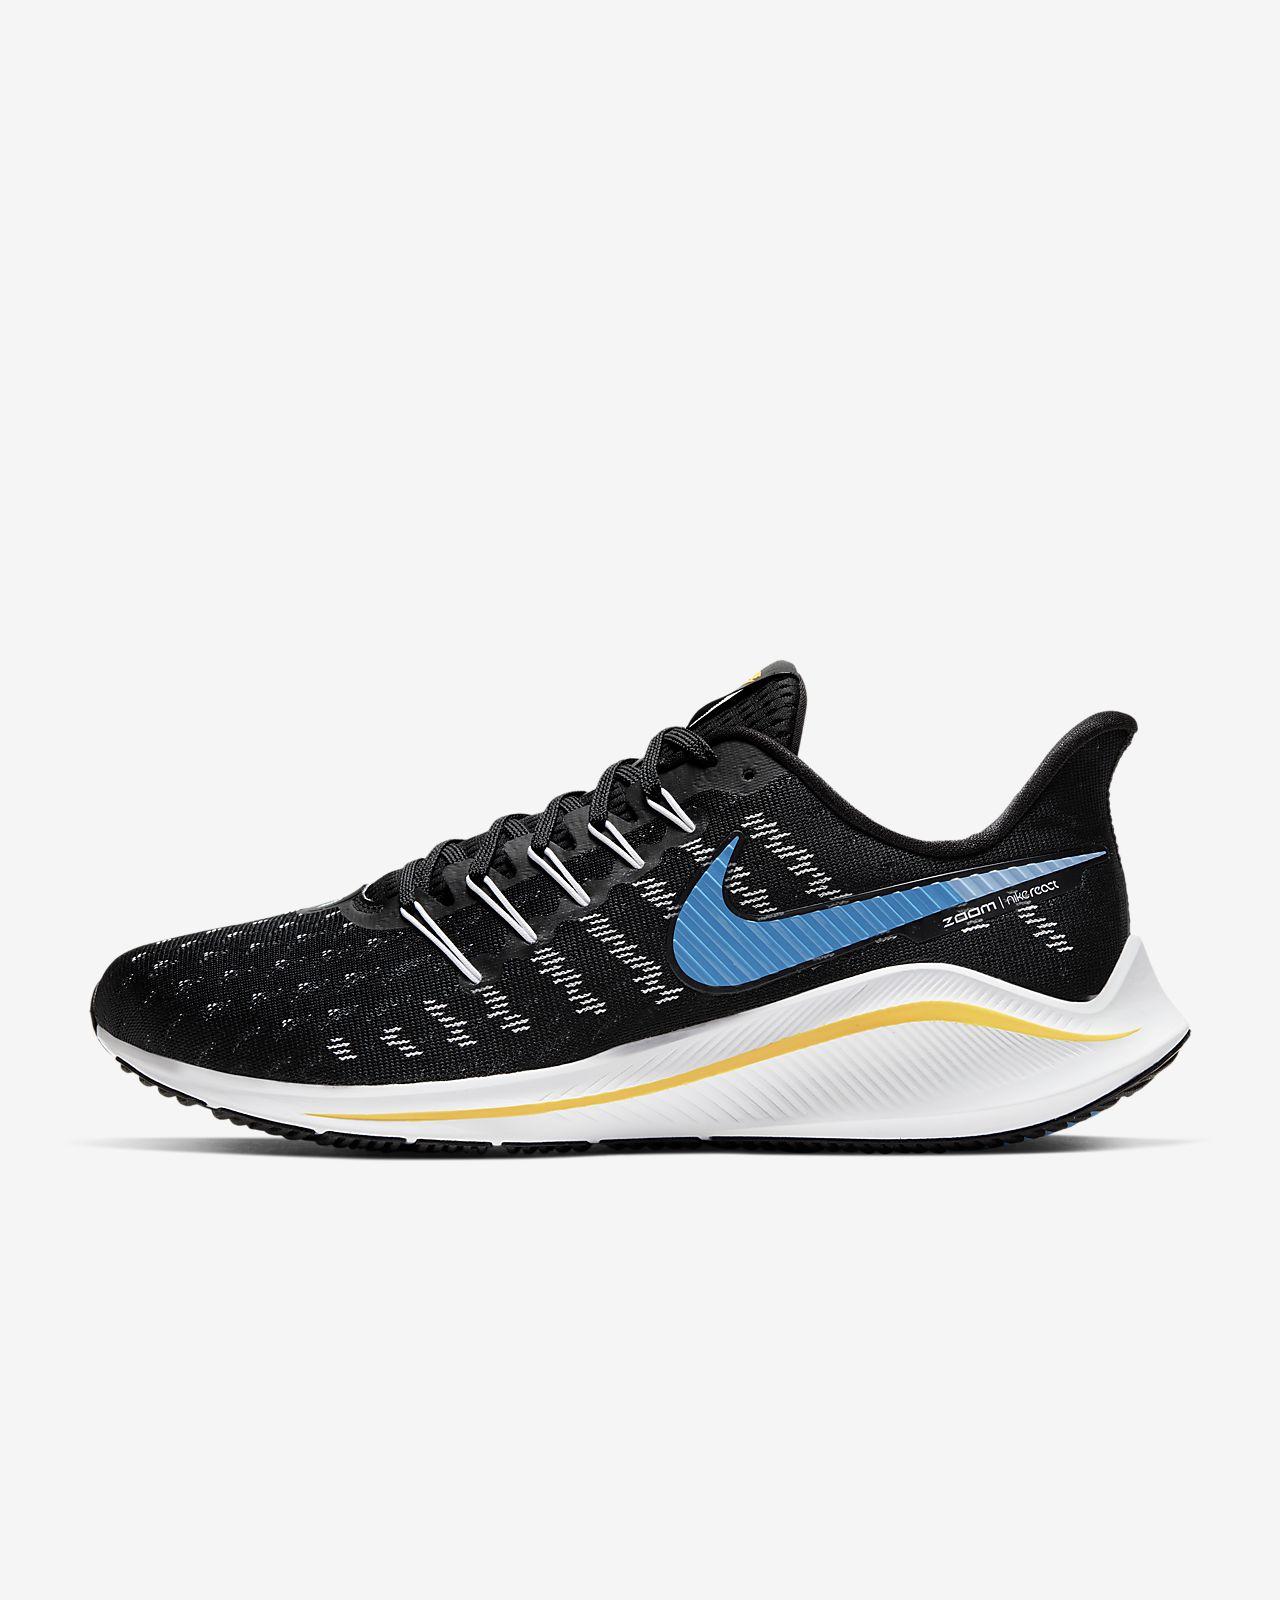 Scarpa da running Nike Air Zoom Vomero 14 Uomo